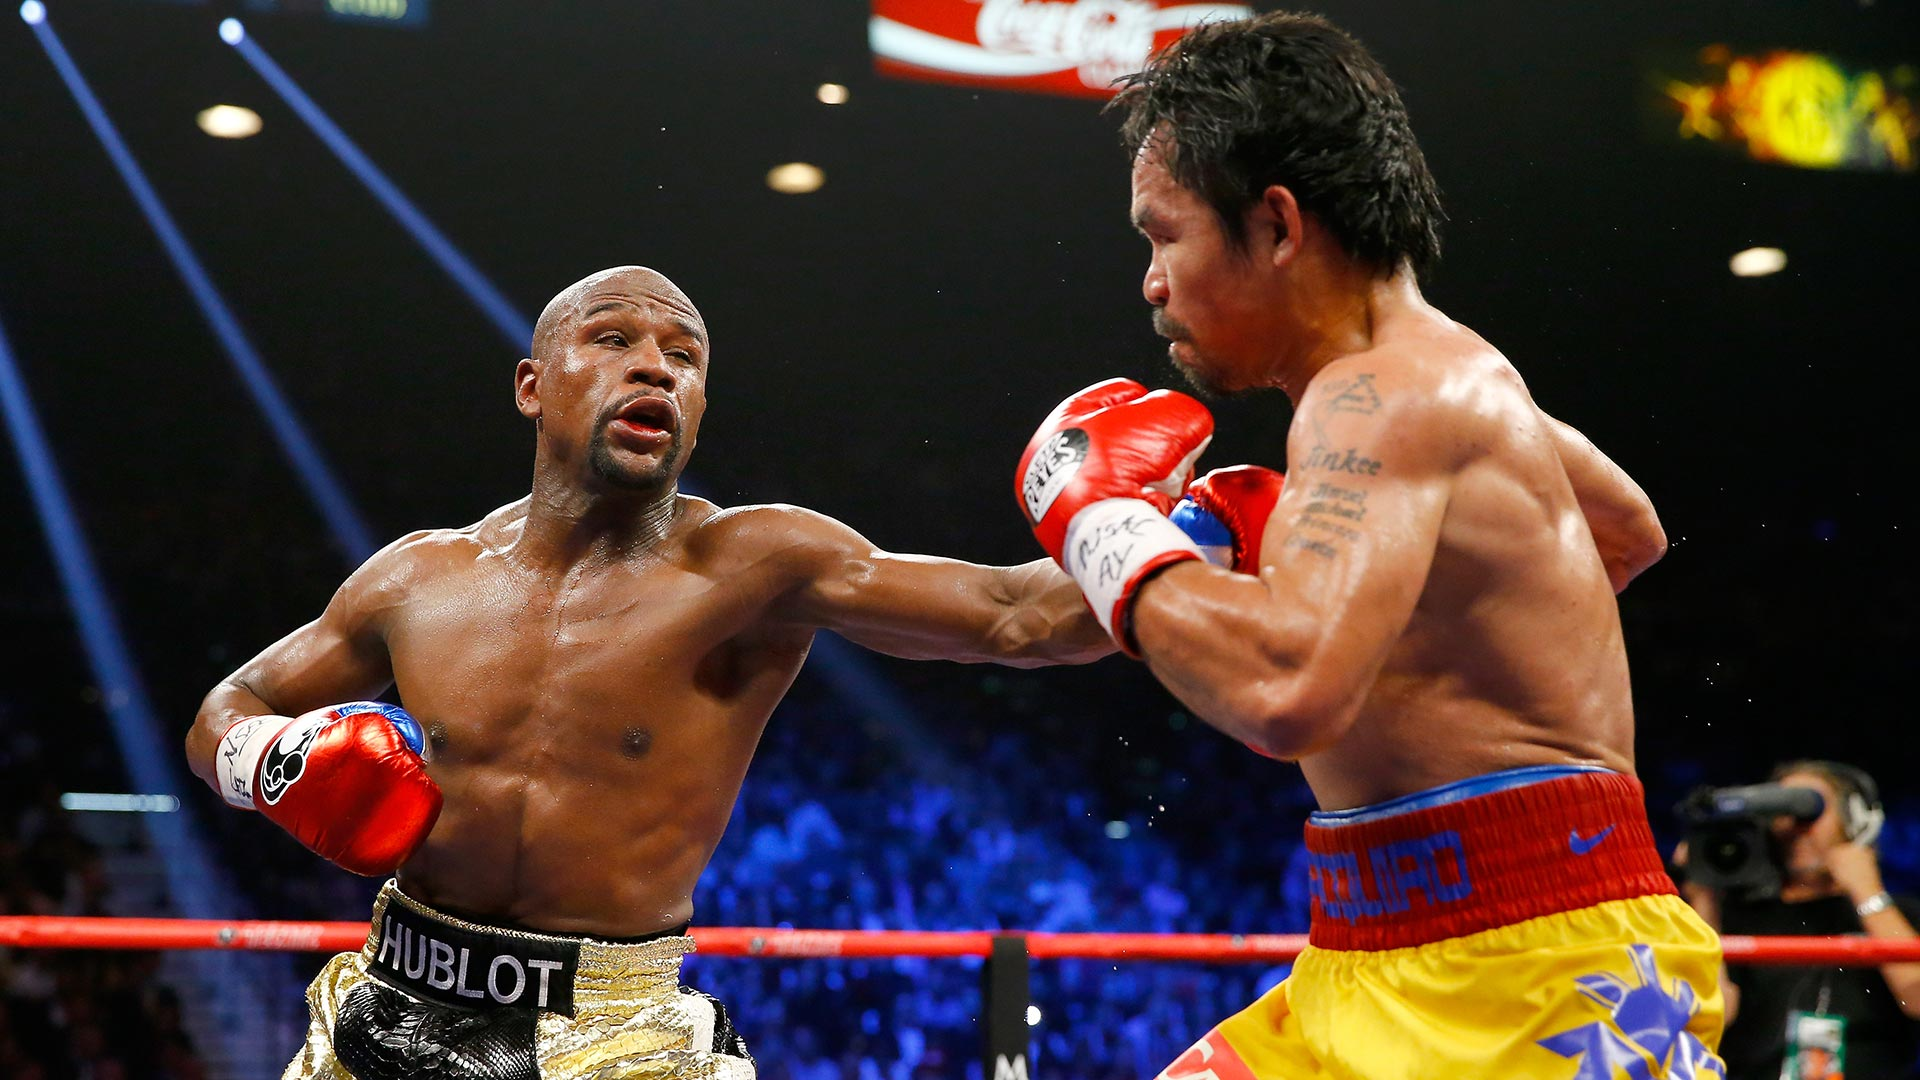 Reportan avances importantes en Mayweather- Manny Pacquiao 2